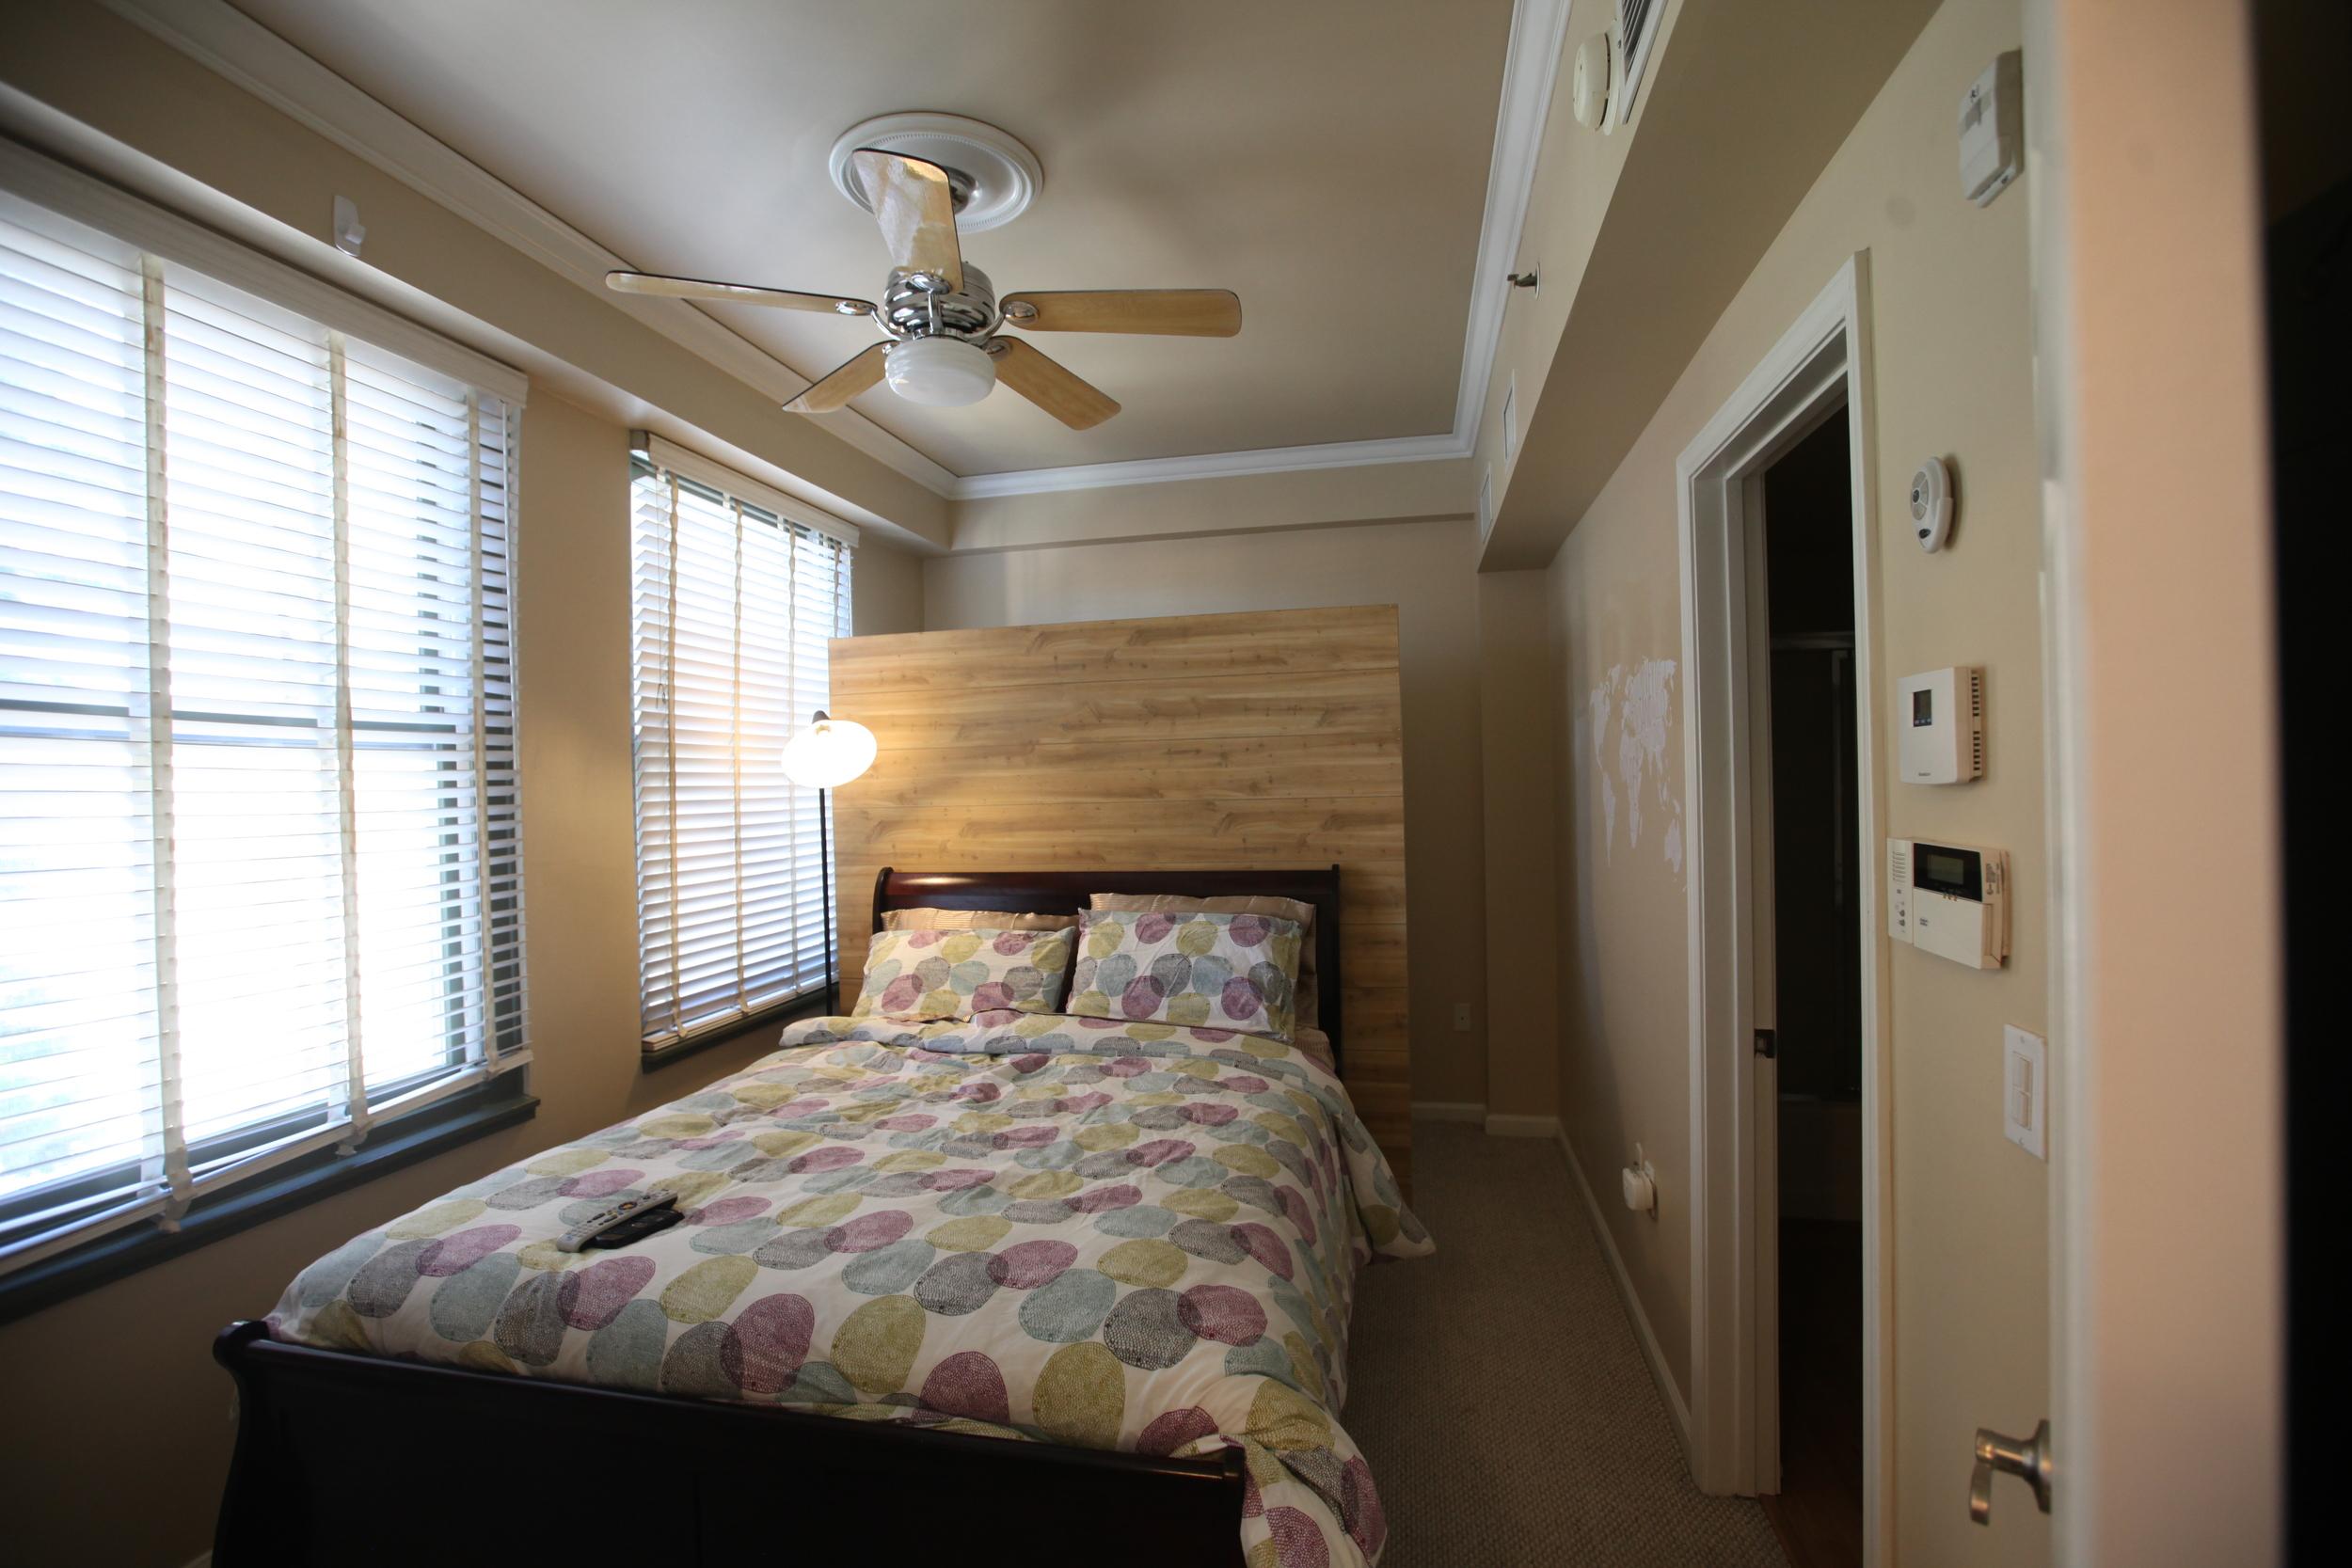 Unit 320 Bedroom